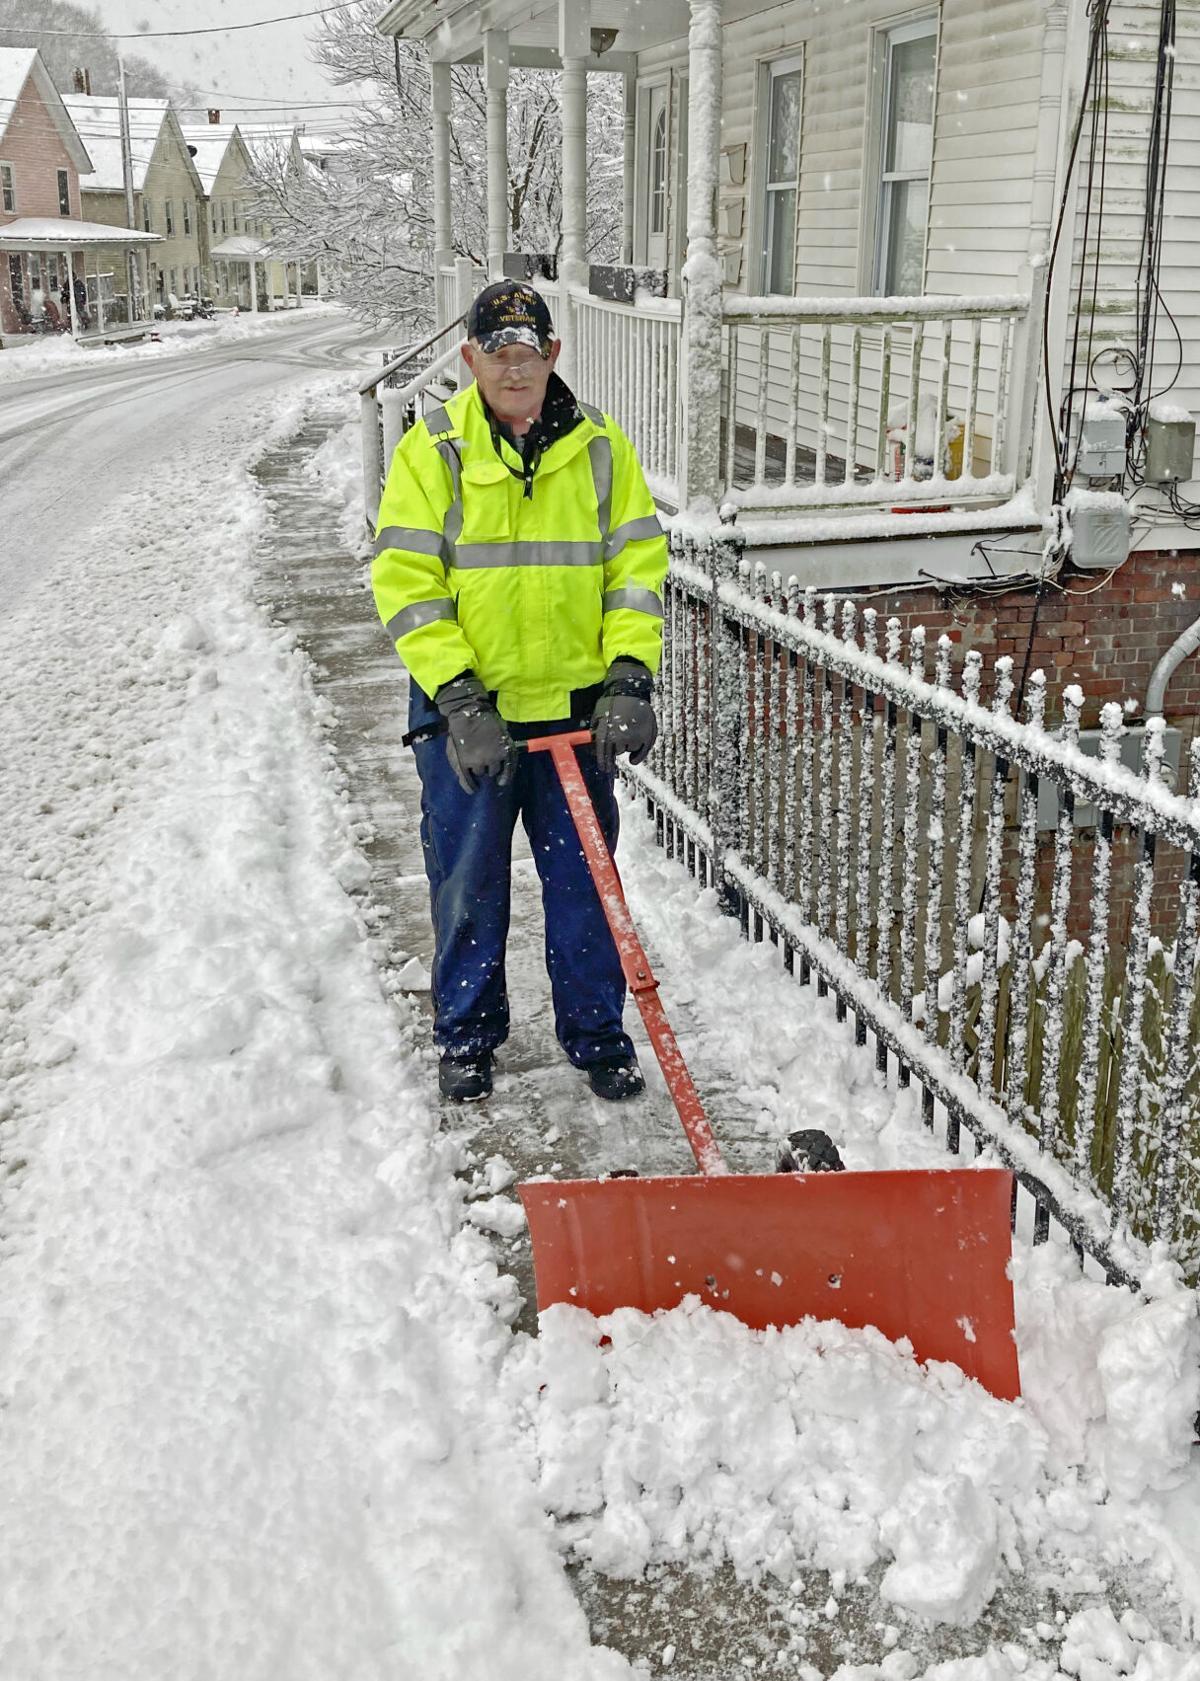 021021 North End shoveling hero 28479.JPG